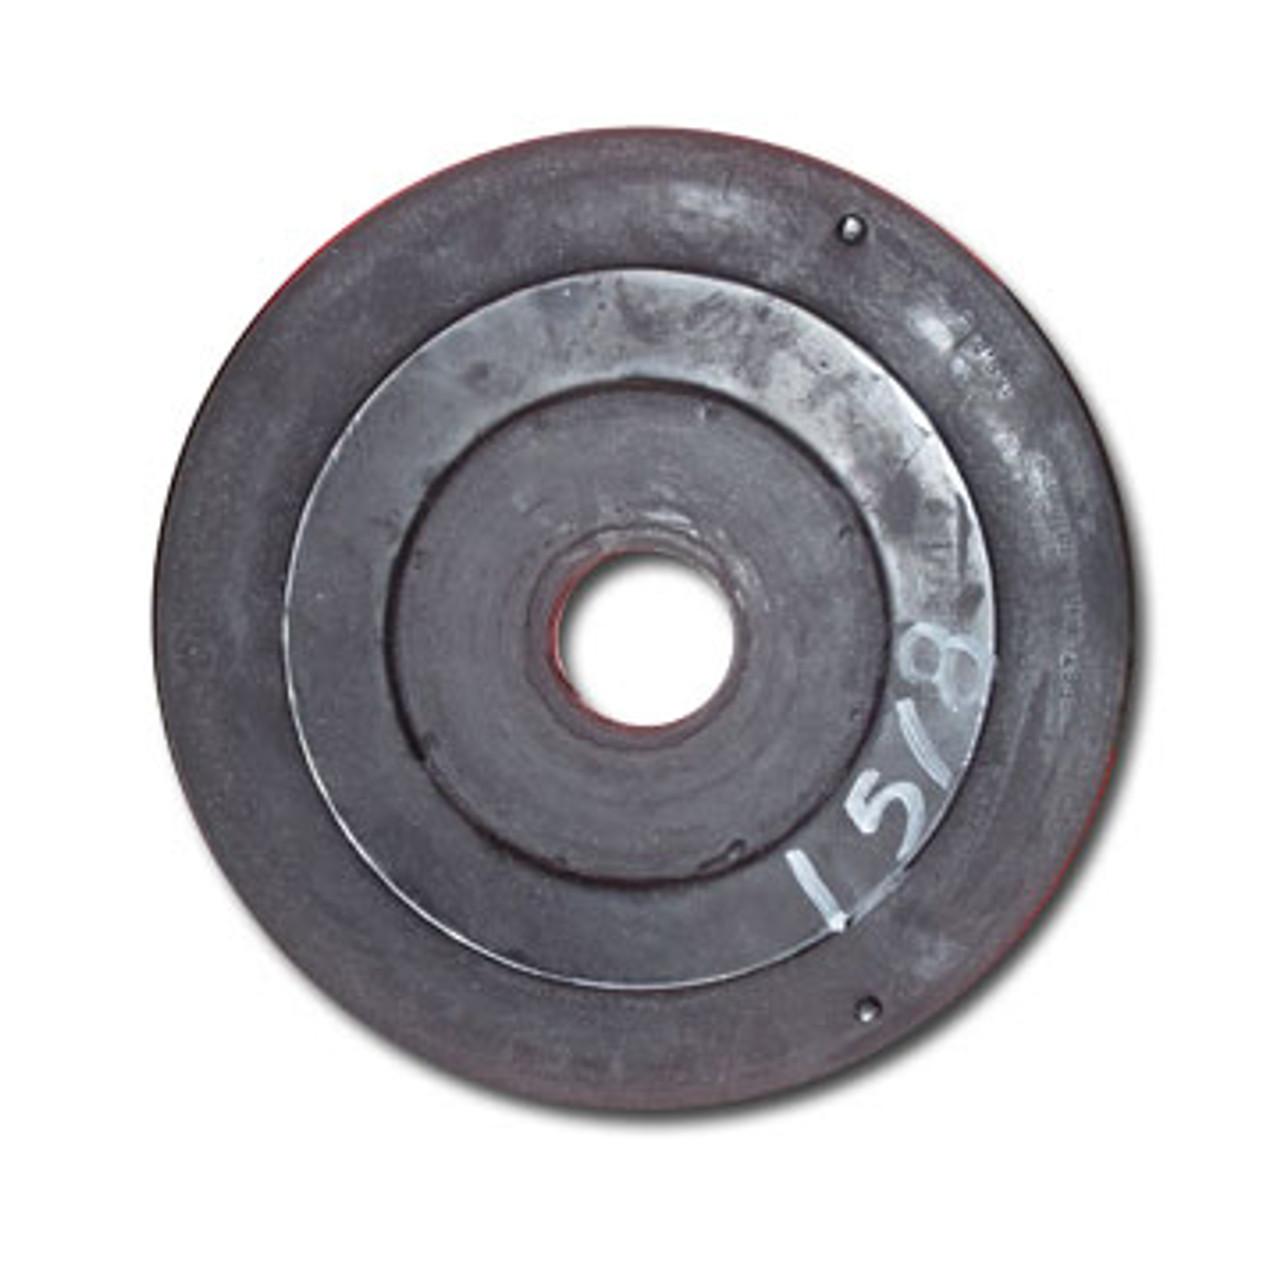 "RW 1.62 Rod Wiper 1.62"" Rod Size 2.06"" Fits DW JT1720 and VM 16x20, 24x26, D24, 12x20, 18x22"